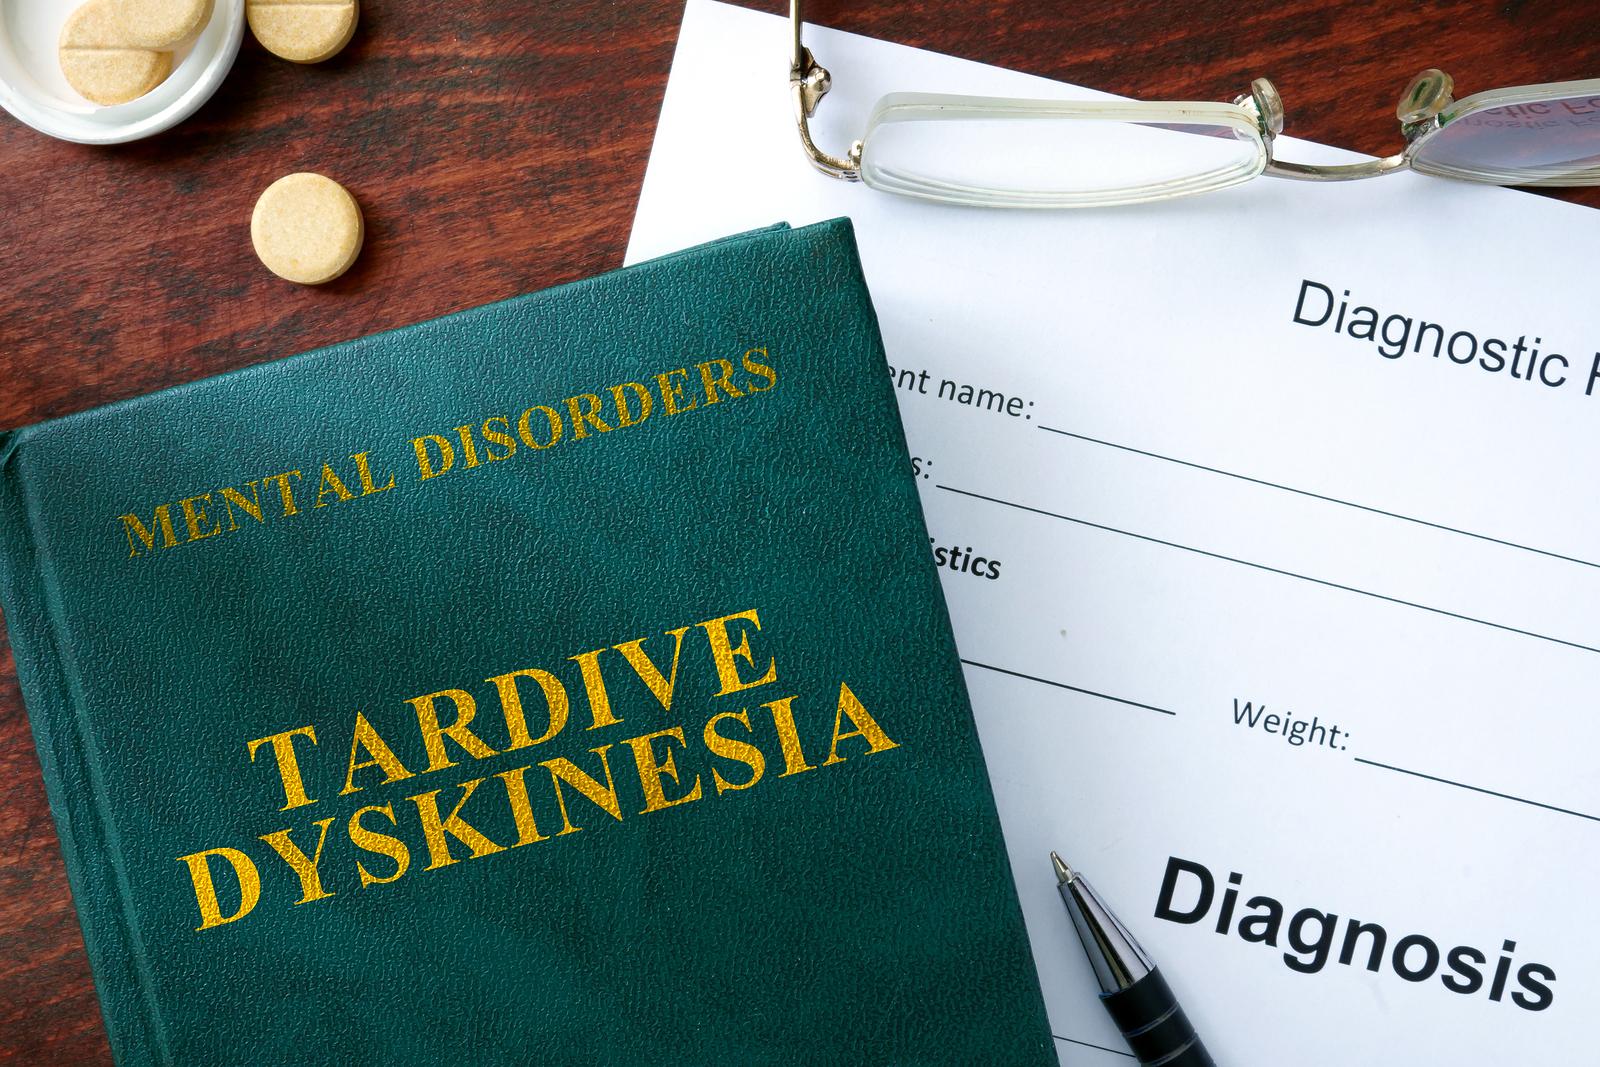 Tardive Dyskinesia and Marijuana Information: Treat Tardive's With Cannabis